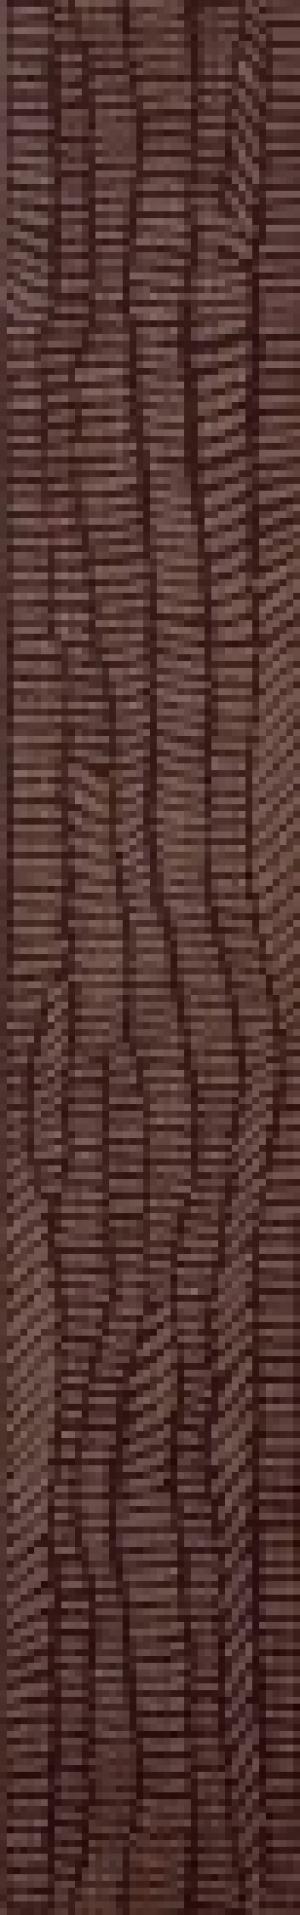 Dlaždica-bordura 60x9,3 Rako Defile DDRST361 hnedá